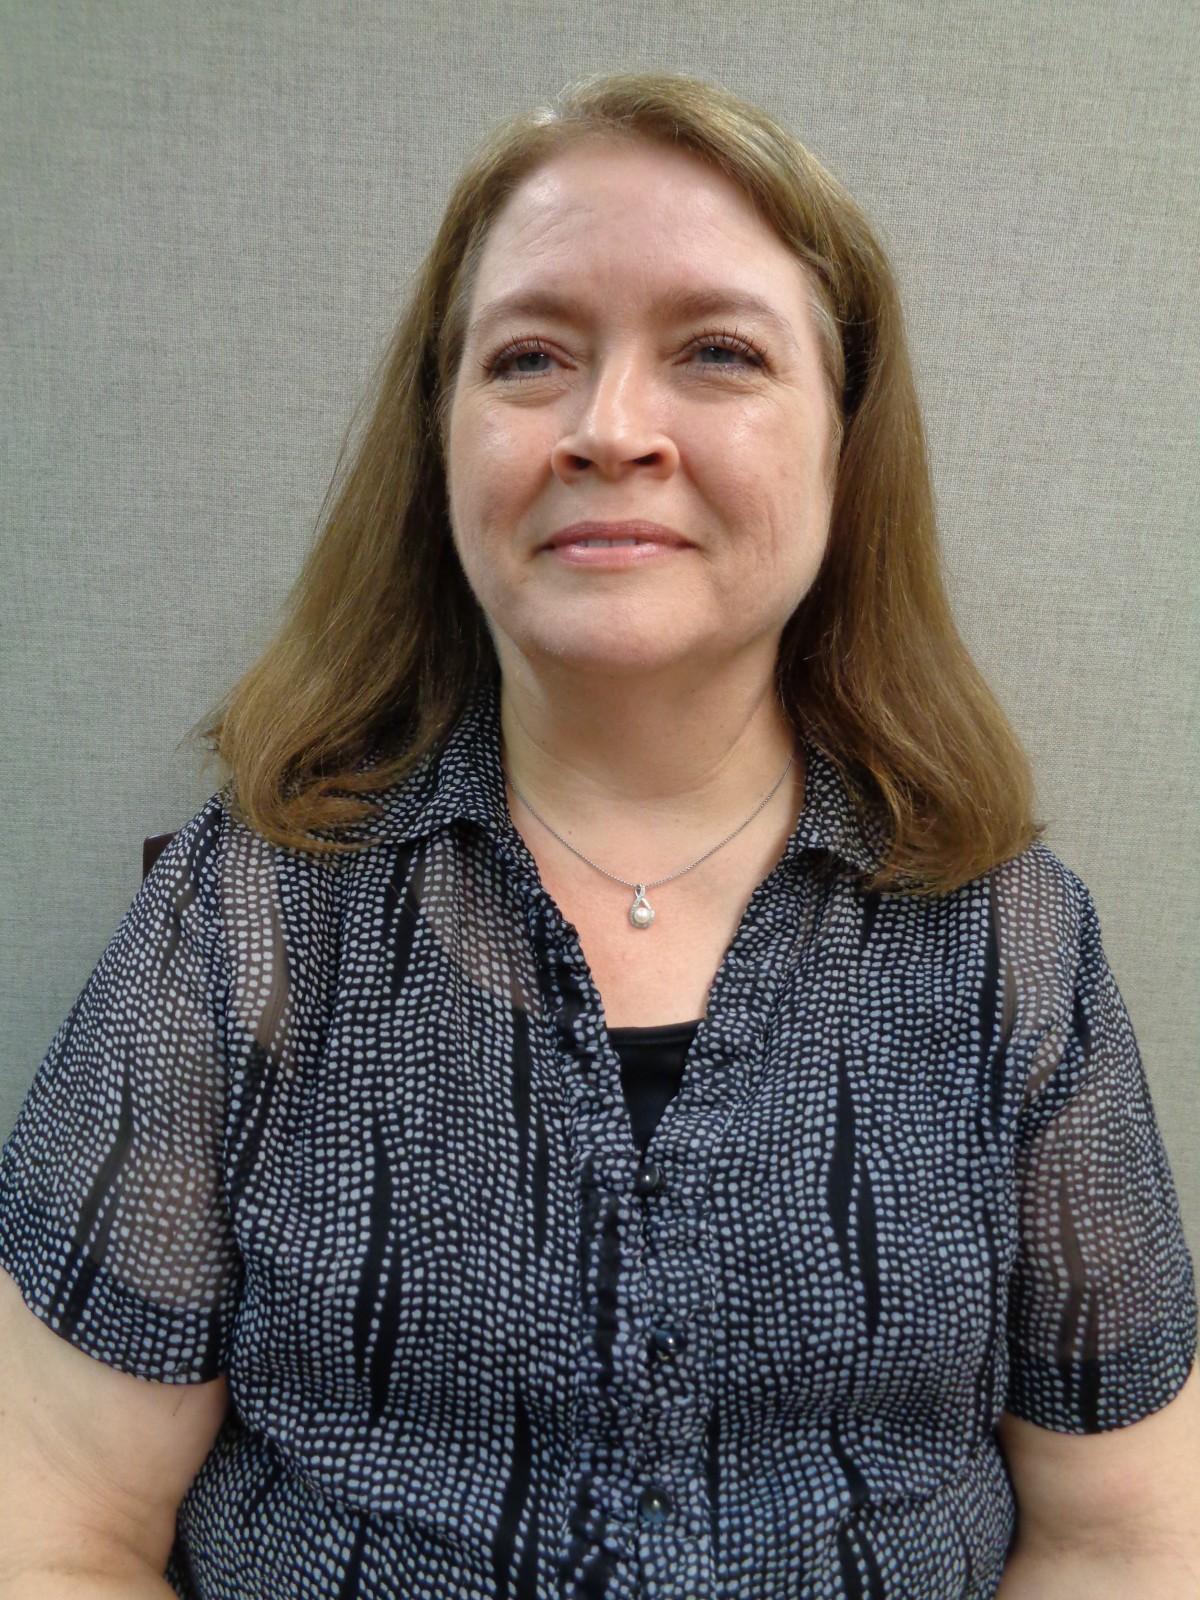 DCPS Educator Earns National LDC Juror Certification